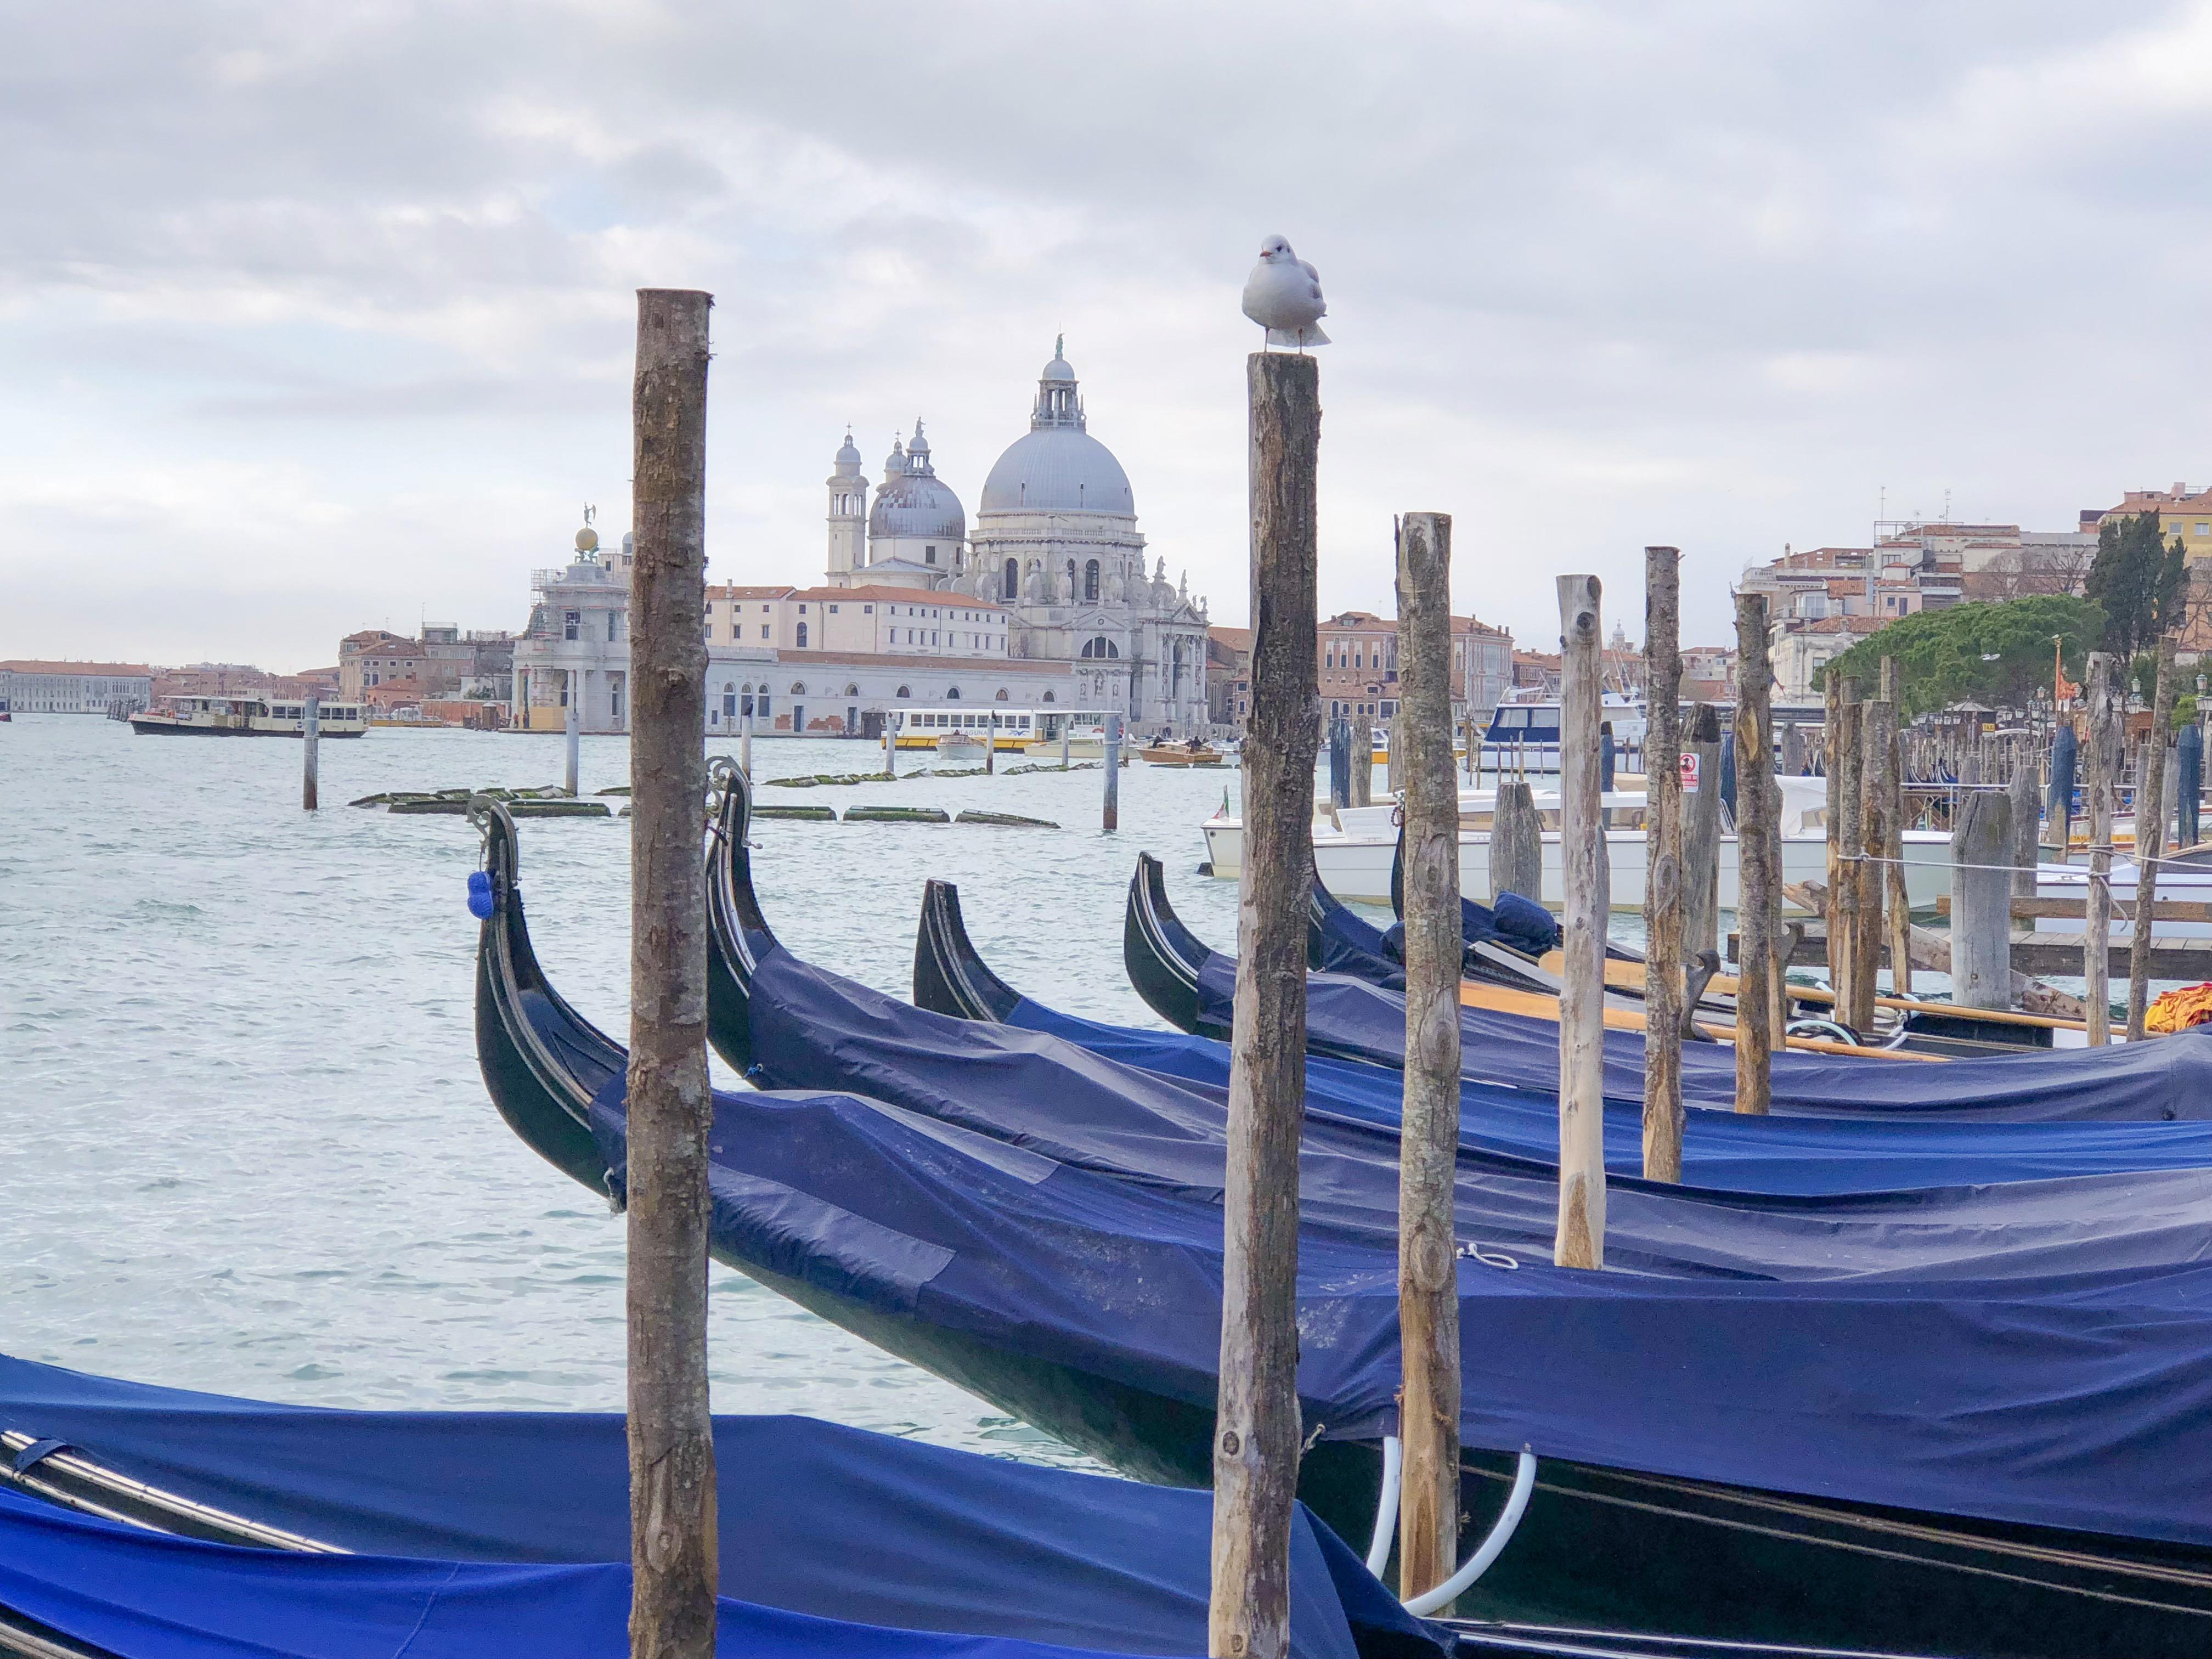 passeio de gondola em Veneza , quanto custa